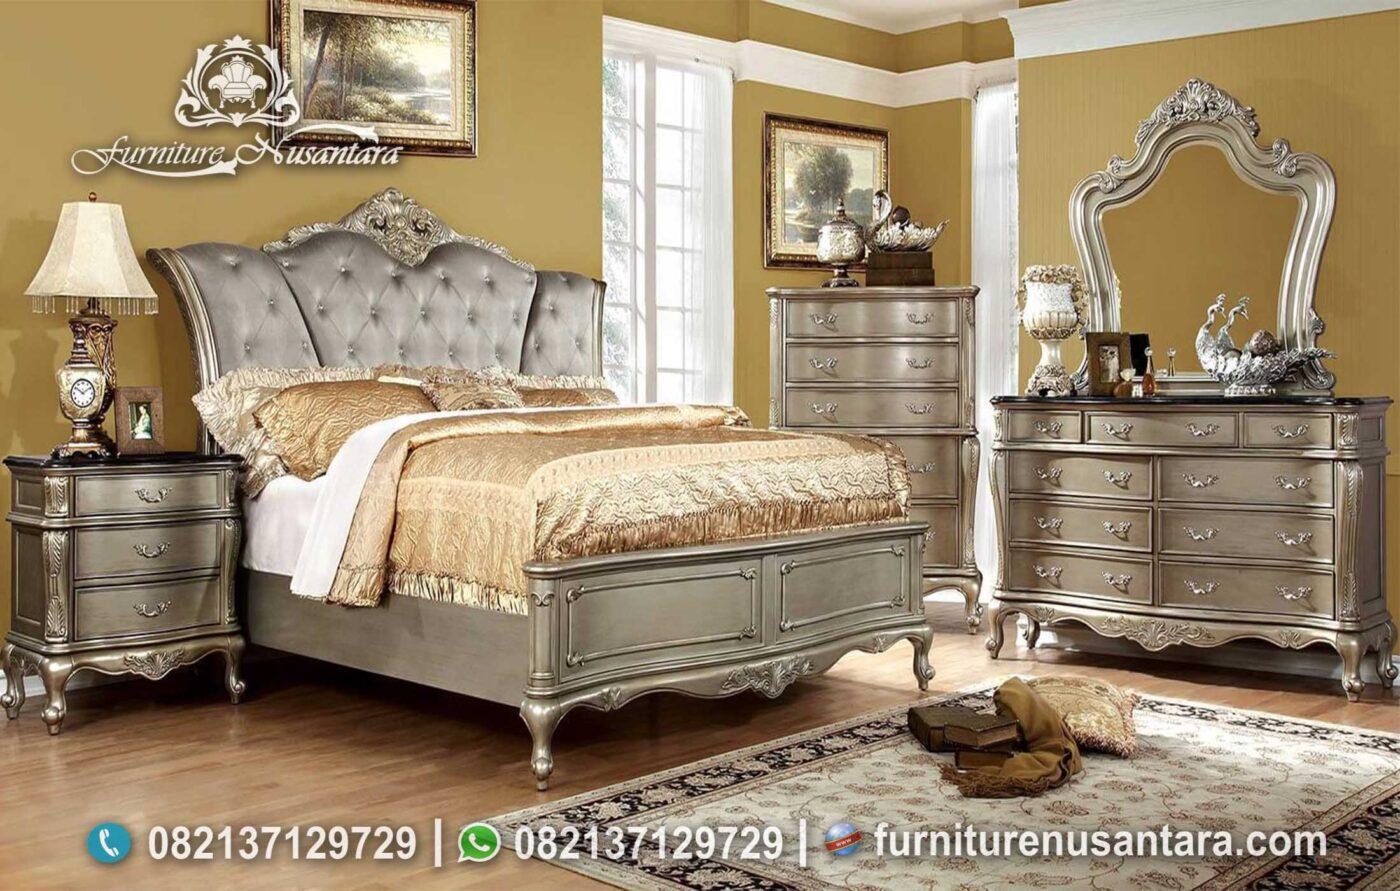 New Model Tempat Tidur Terbaru KS-148, Furniture Nusantara